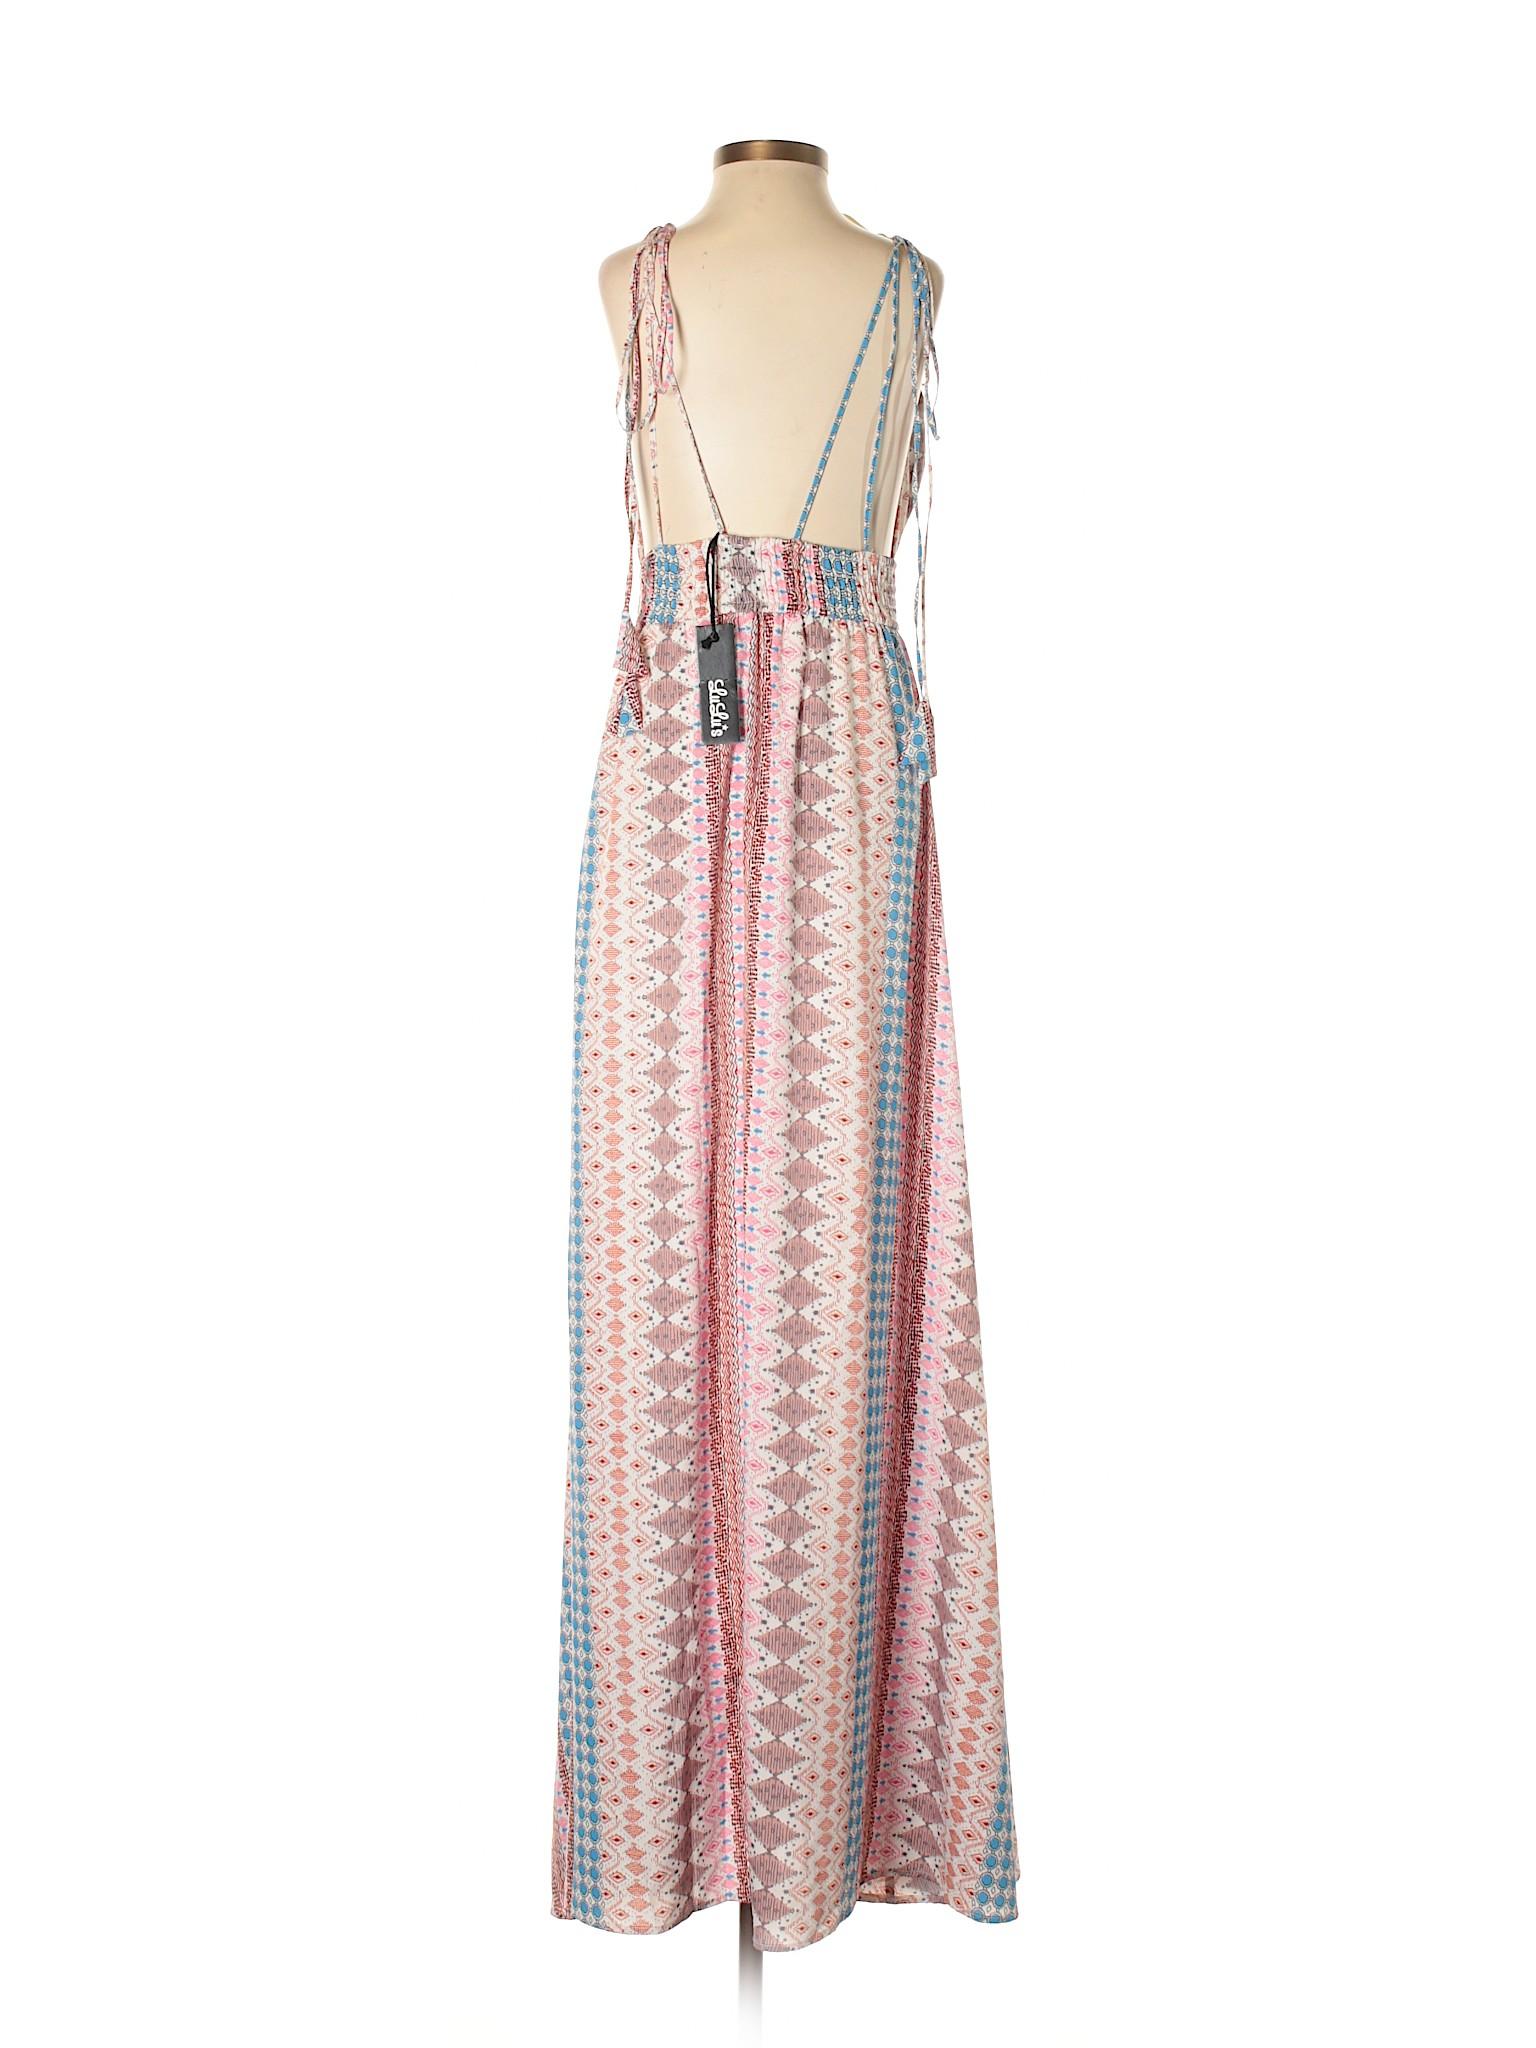 Casual Boutique Boutique Lulu's Dress winter winter Lulu's fwSqnvTw